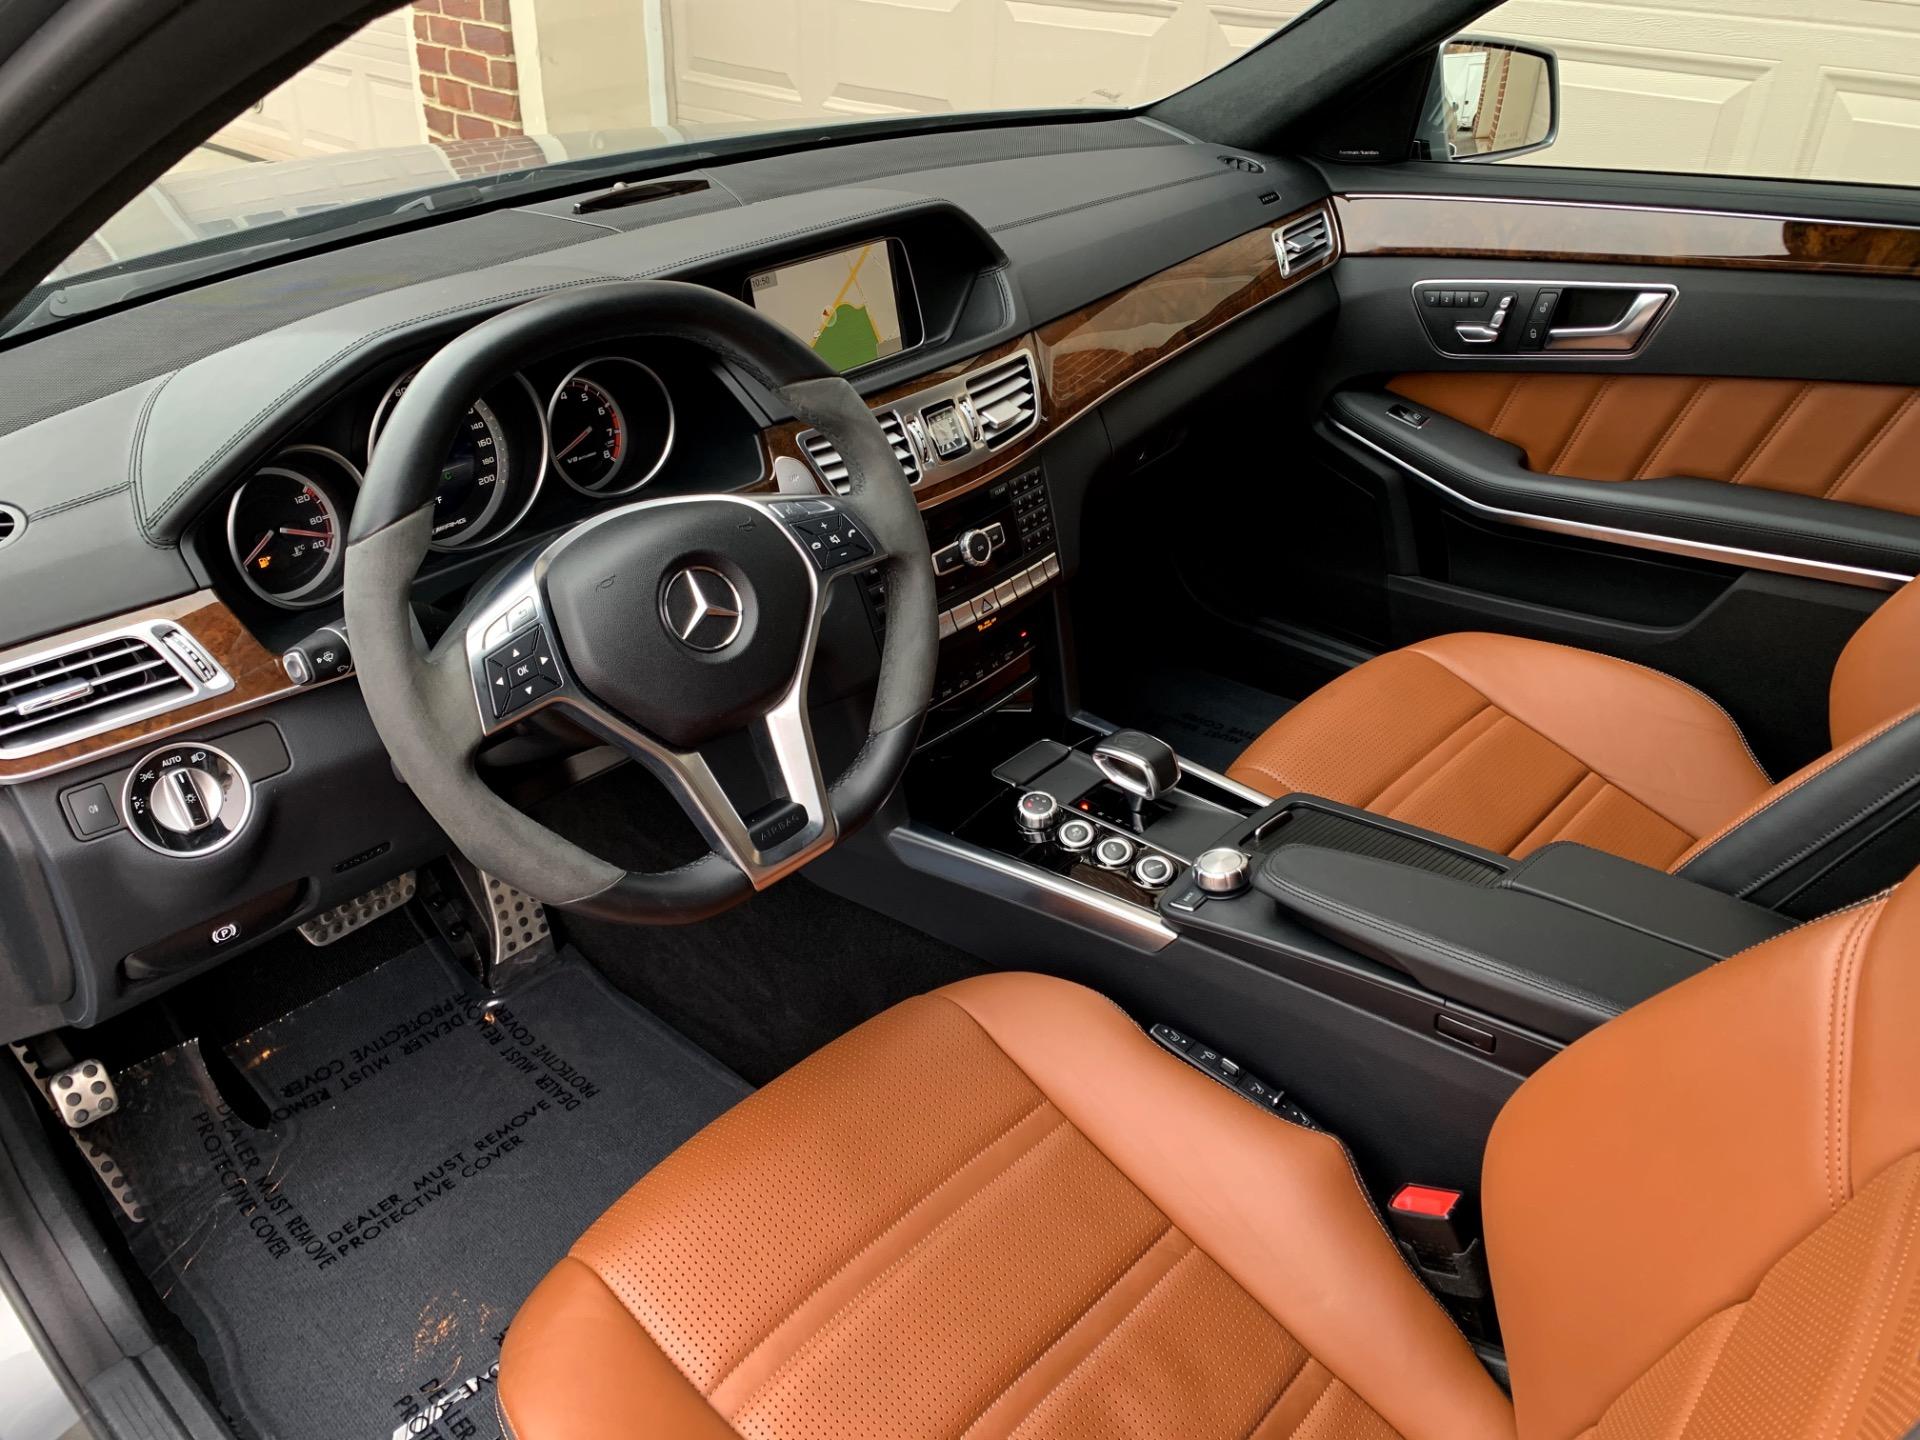 Used-2015-Mercedes-Benz-E-Class-E-63-AMG-S-Model